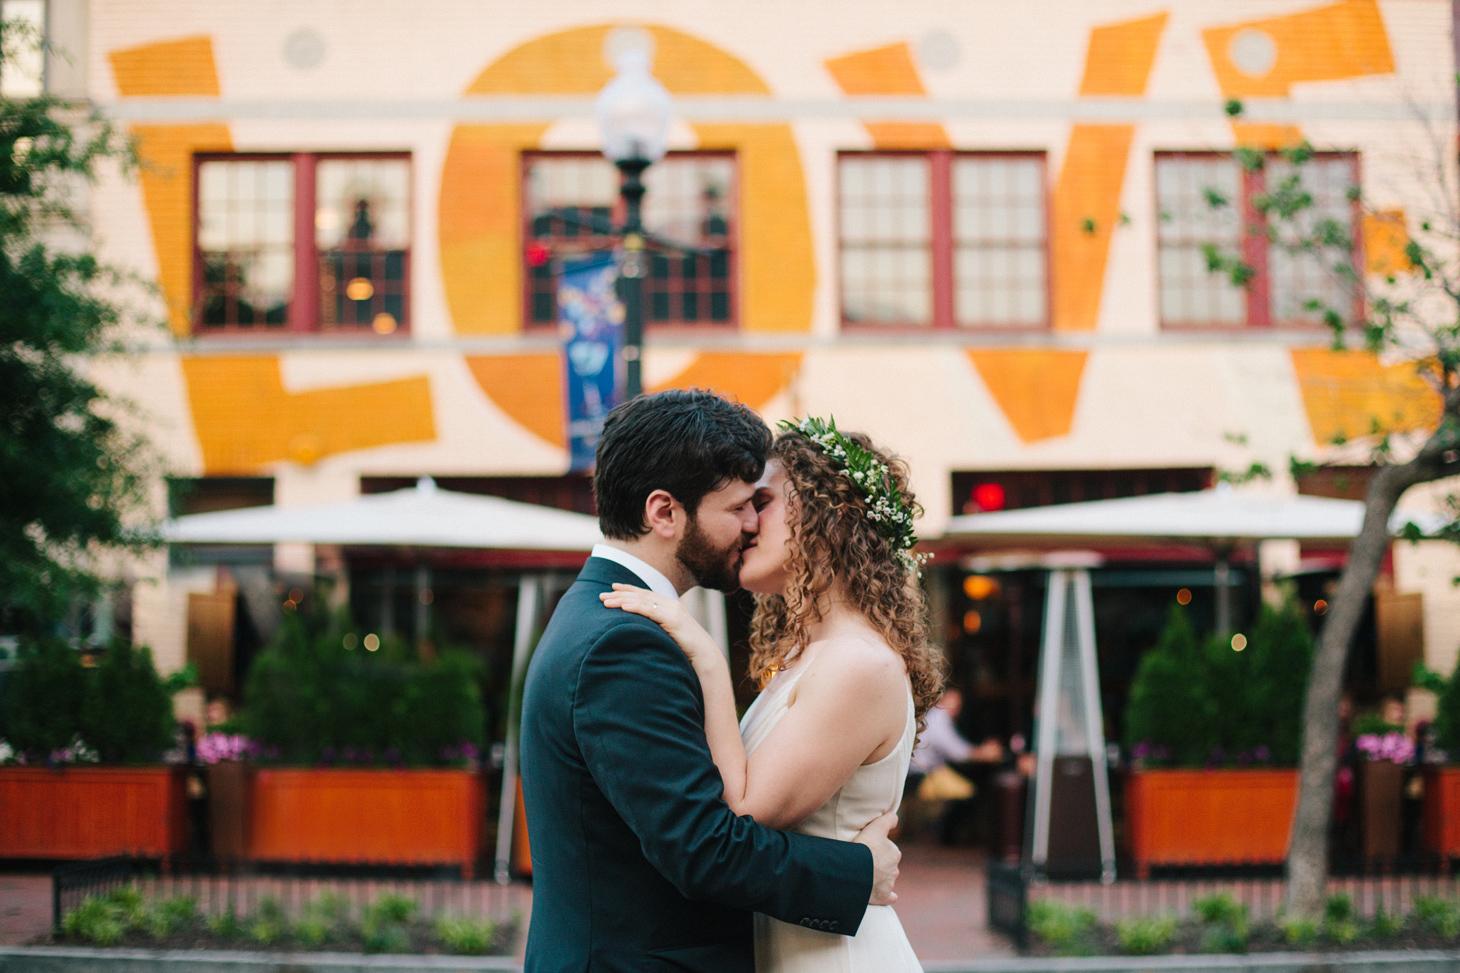 NYC-Wedding-Photographer-APW-A-Practical-Wedding-Smitten-Chickens-Abbey-Eric